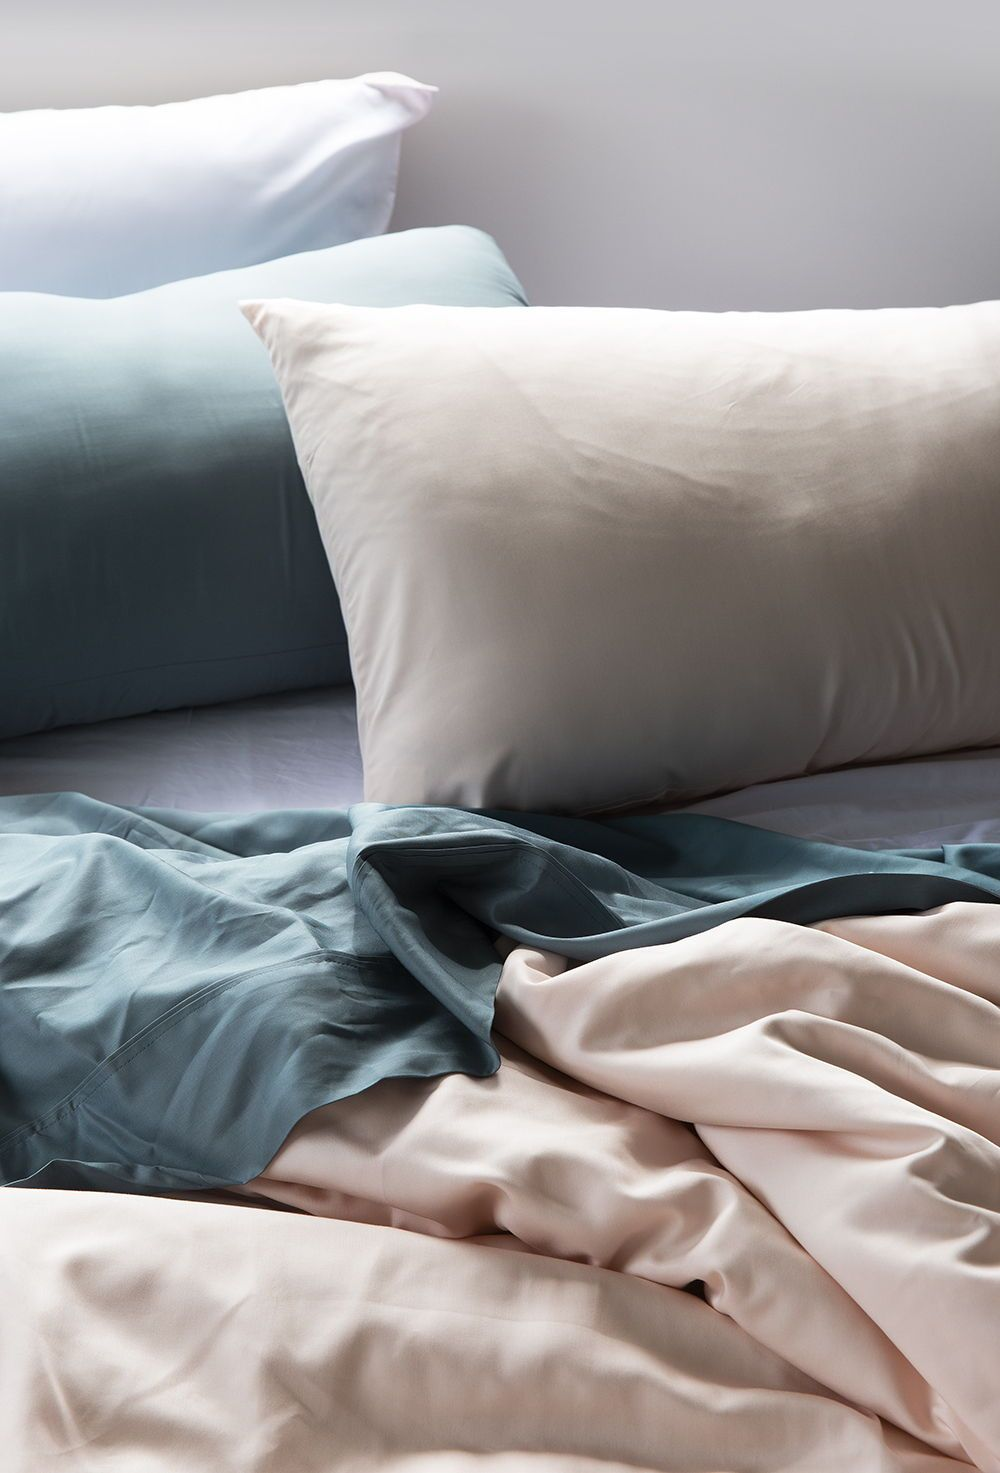 Bed Sheets Bamboo Vs Cotton Bed Sheets Bamboo Vs Cotton